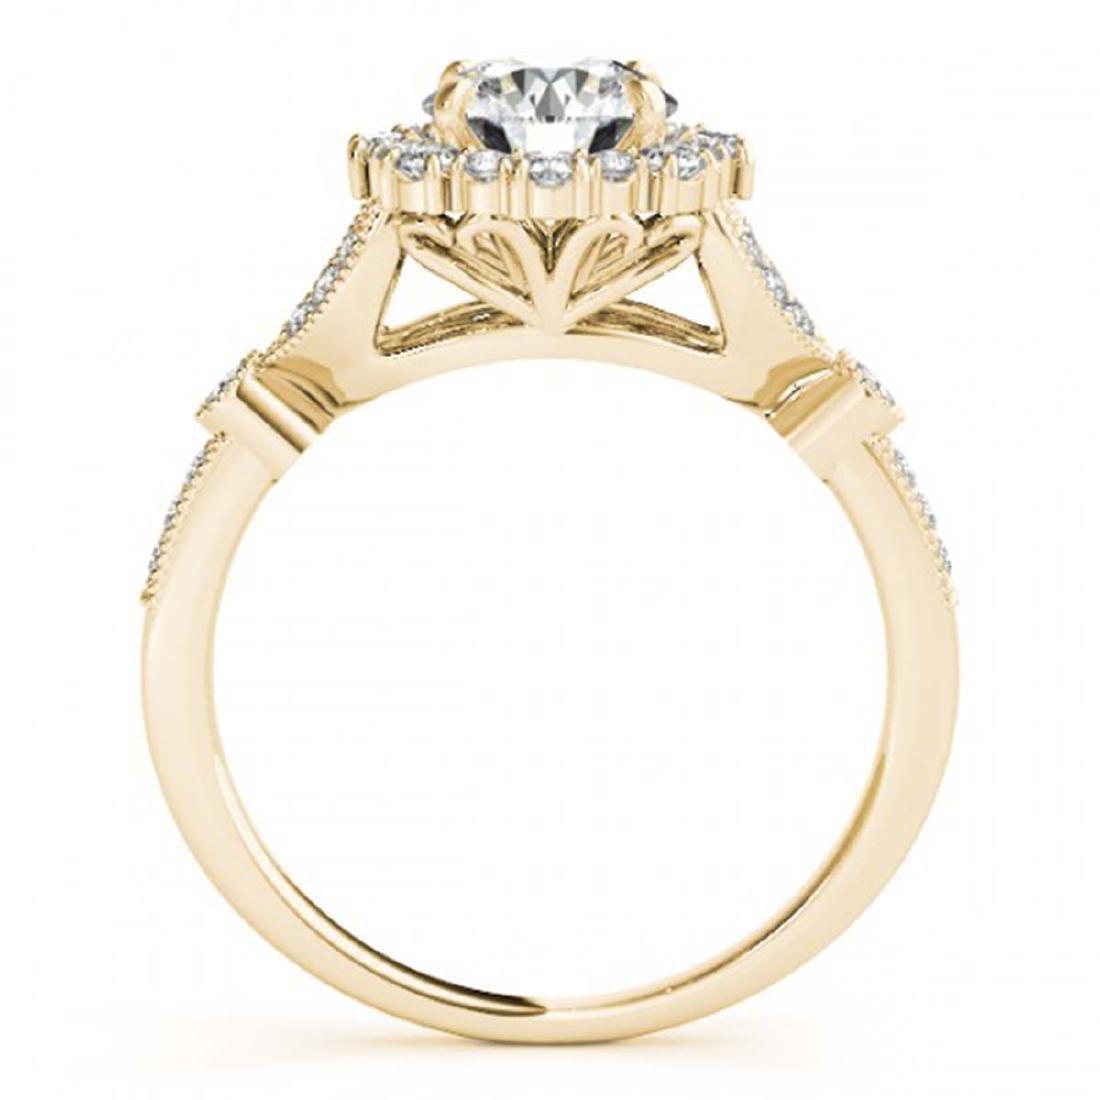 1 ctw VS/SI Diamond Halo Ring 18K Yellow Gold - - 2